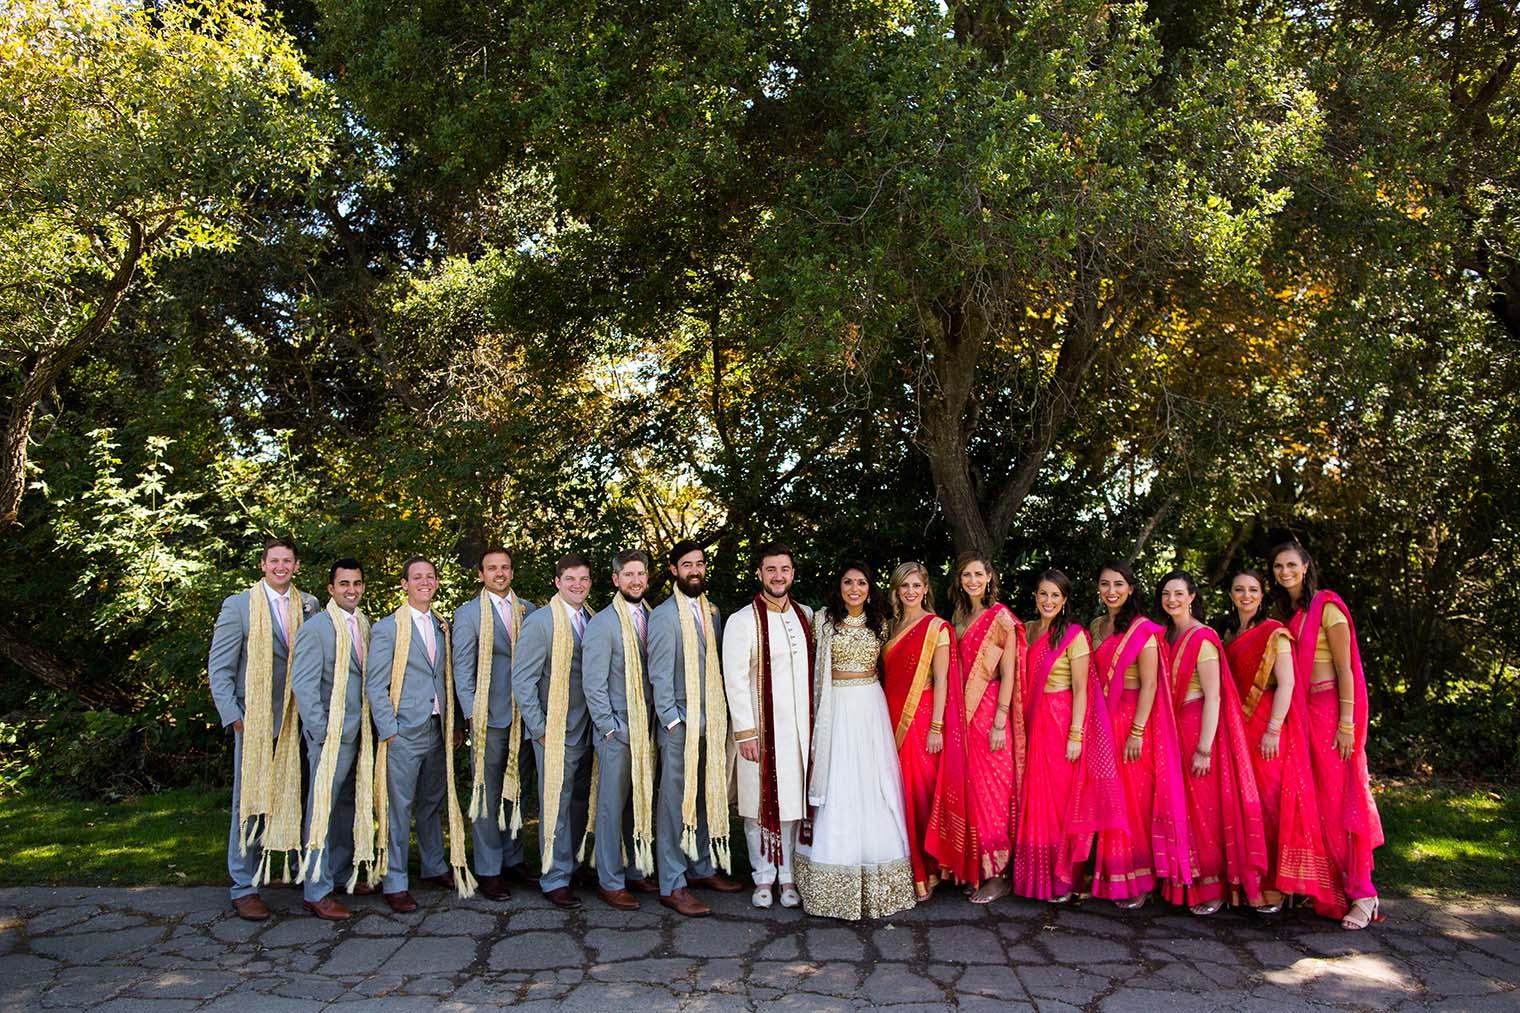 Bridal Party at Chardonnay Golf Club and Vineyards